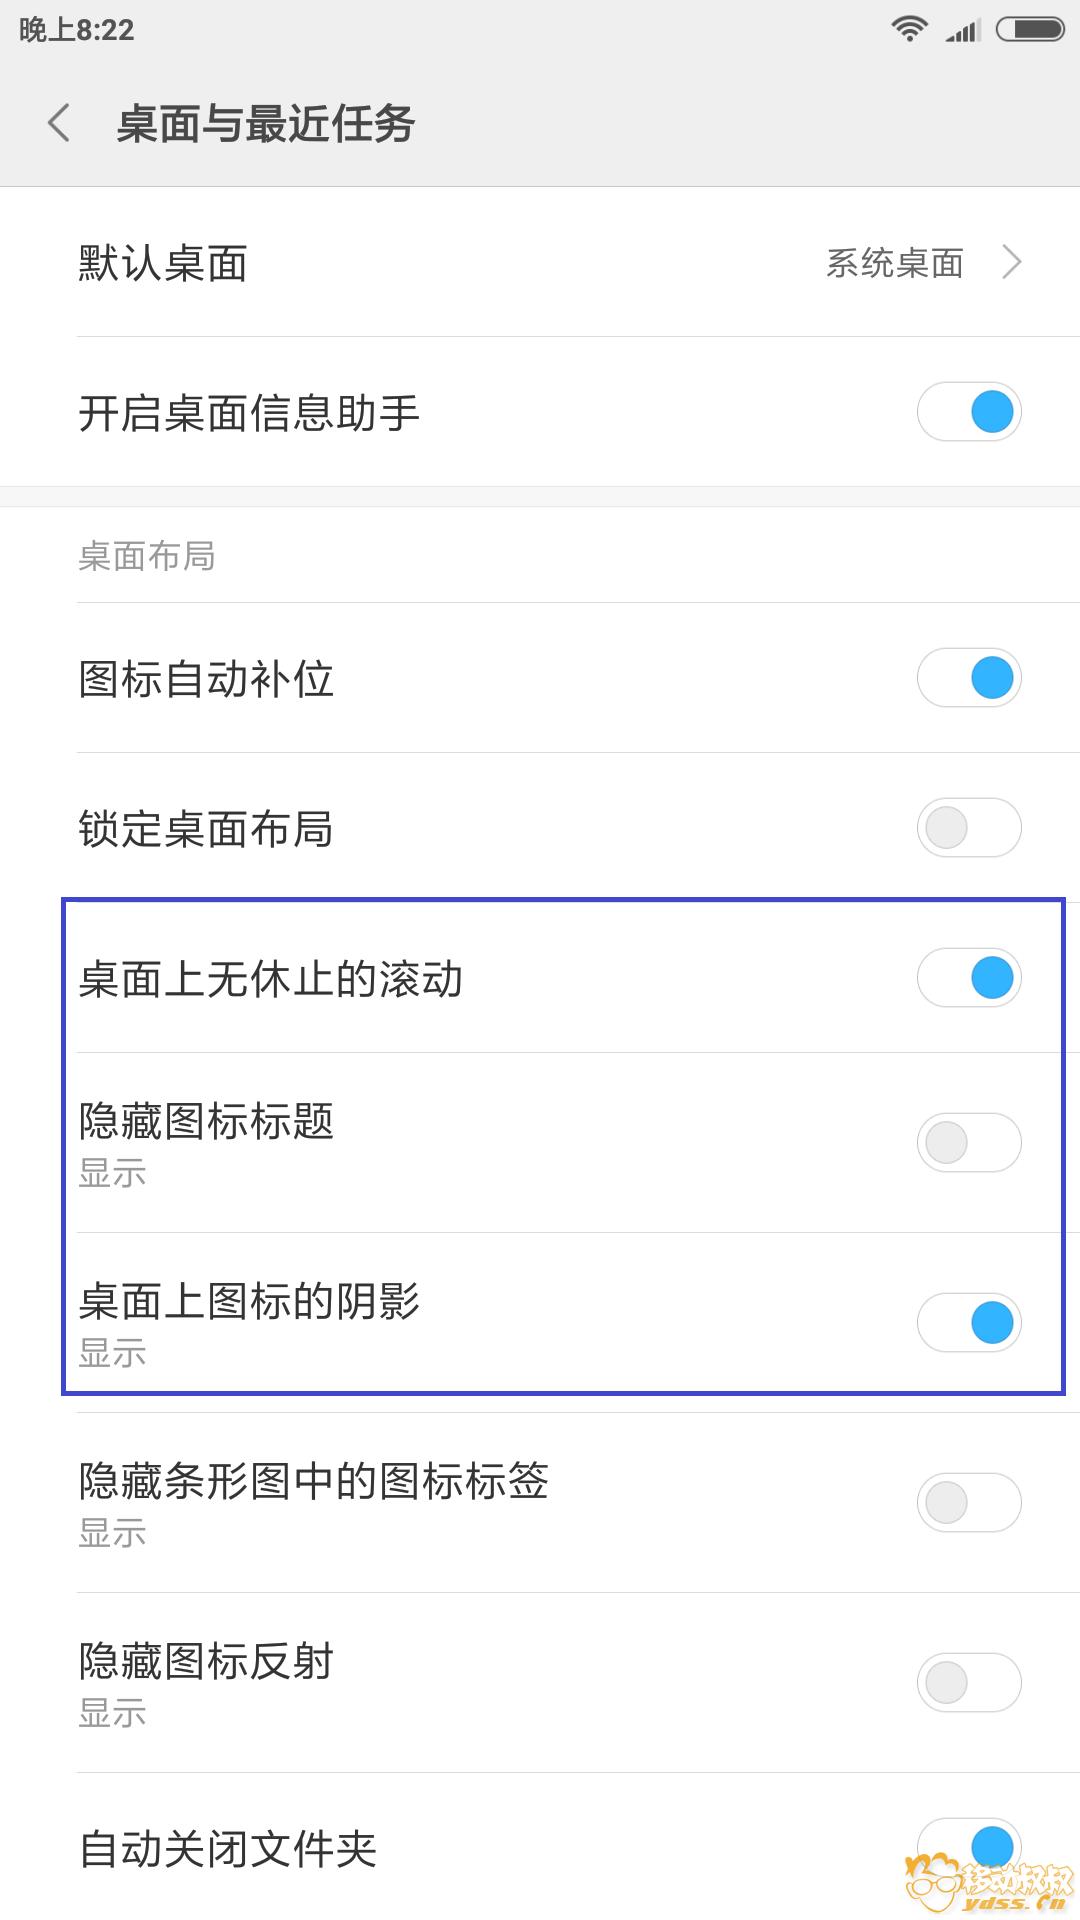 Screenshot_2018-02-28-20-22-31-240_com.android.settings.png